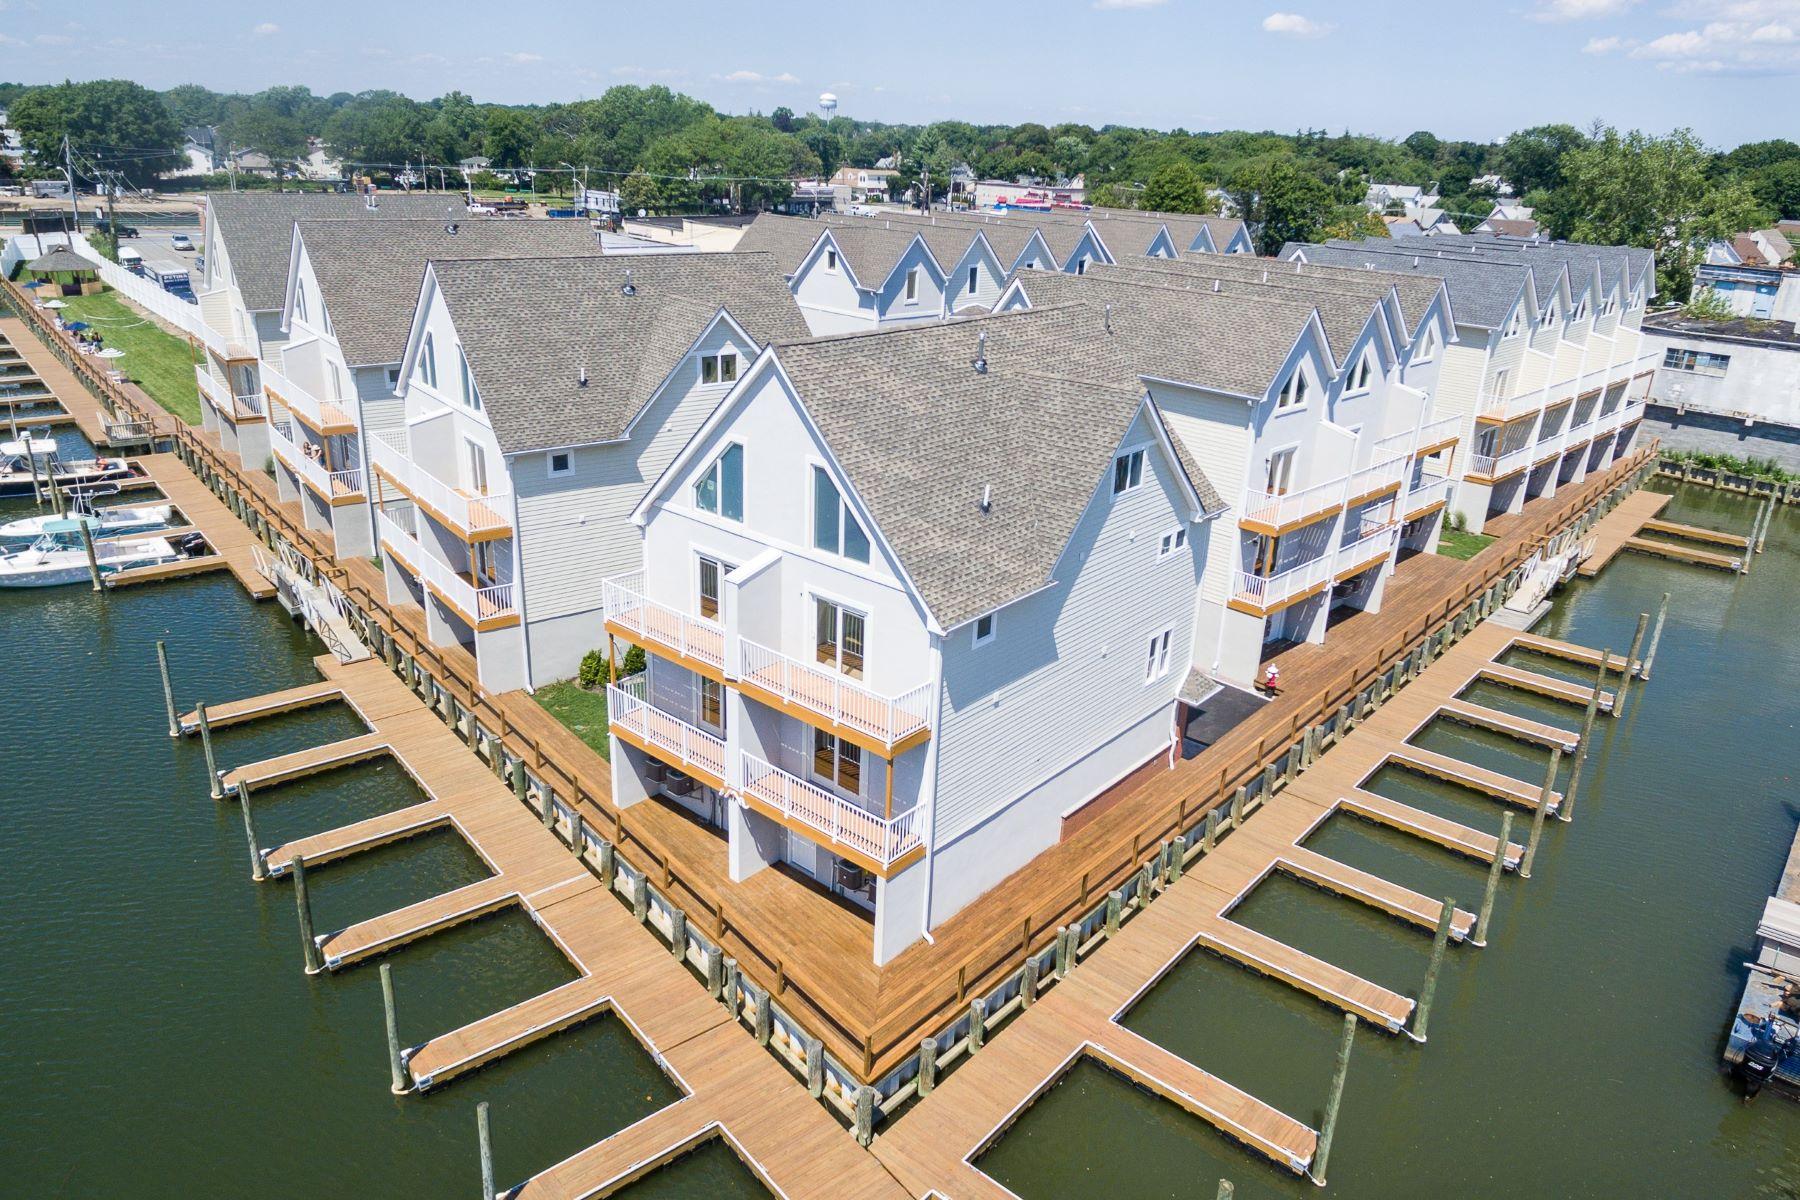 Condominium for Sale at Condo 531 Ray St 1 Freeport, New York 11520 United States